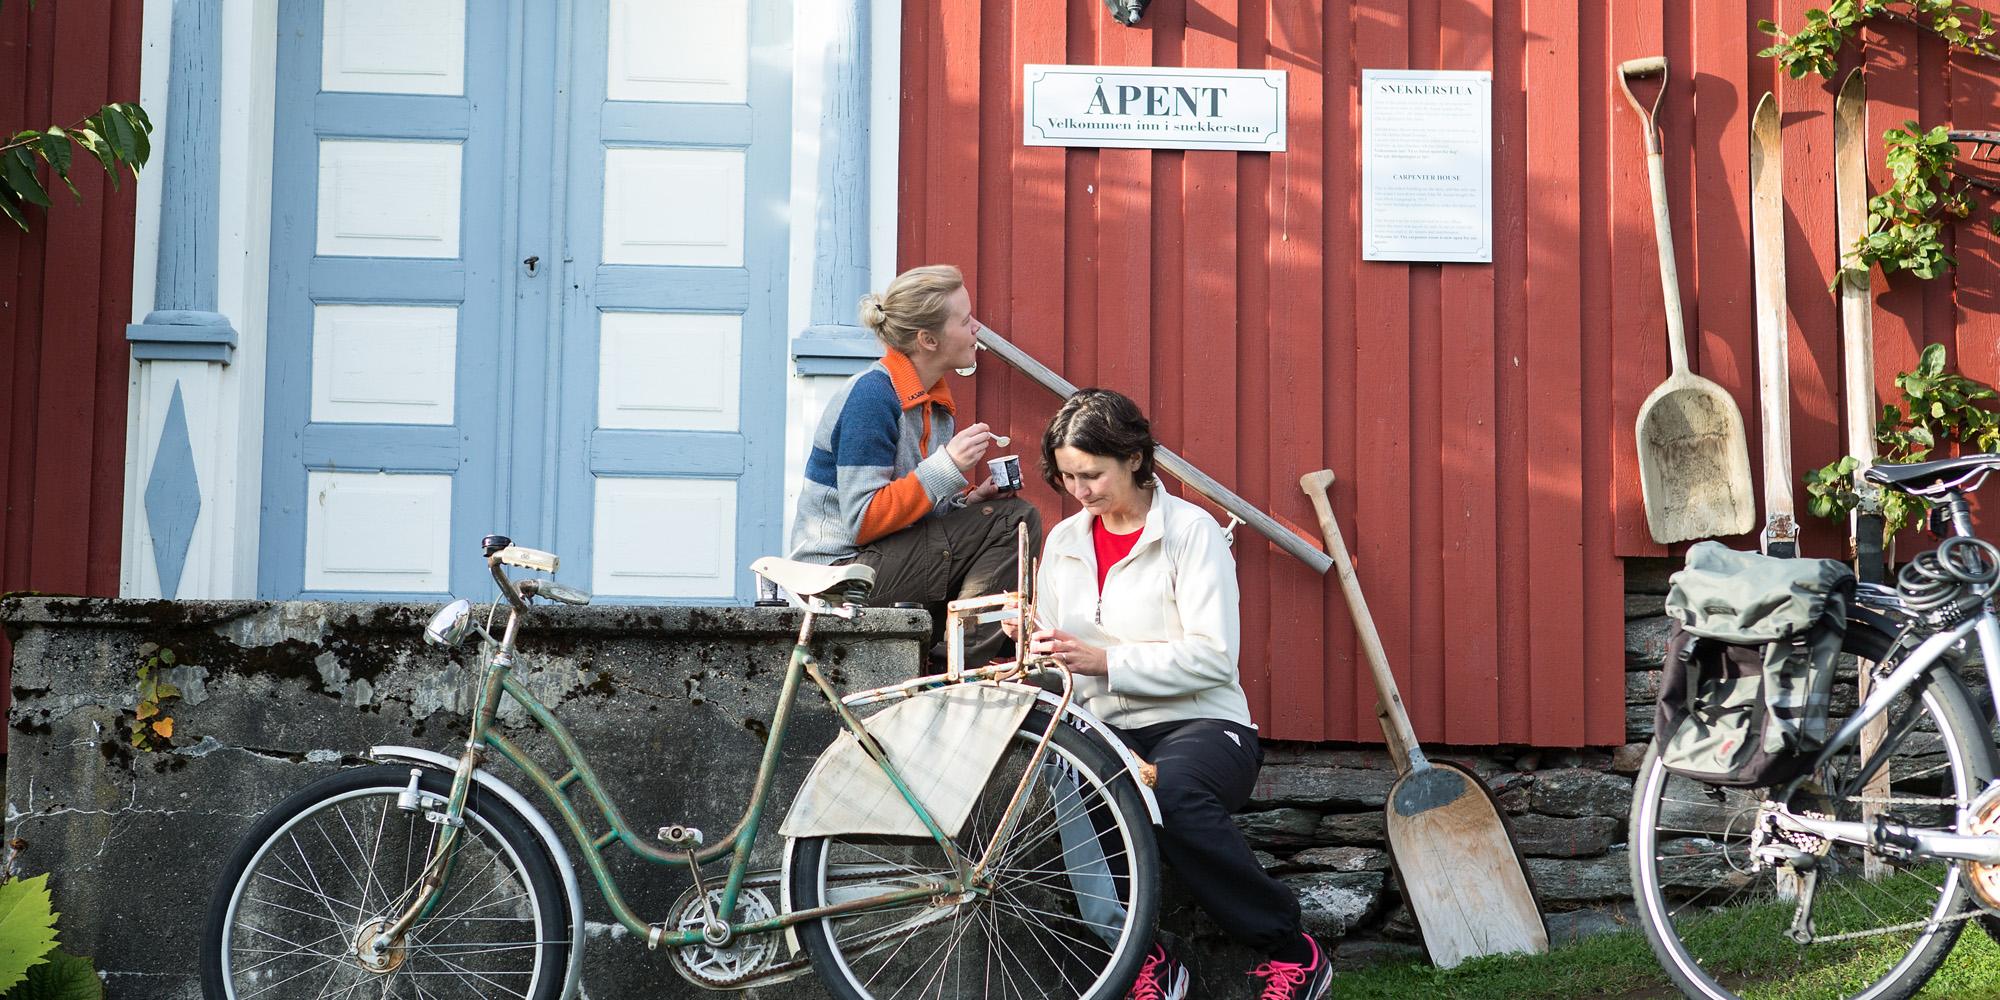 Inderøy Gangstad Foto WilLee-Wright Syklister tar en pause i gårdstunet 2x1. Copyright: WilLee-Wright